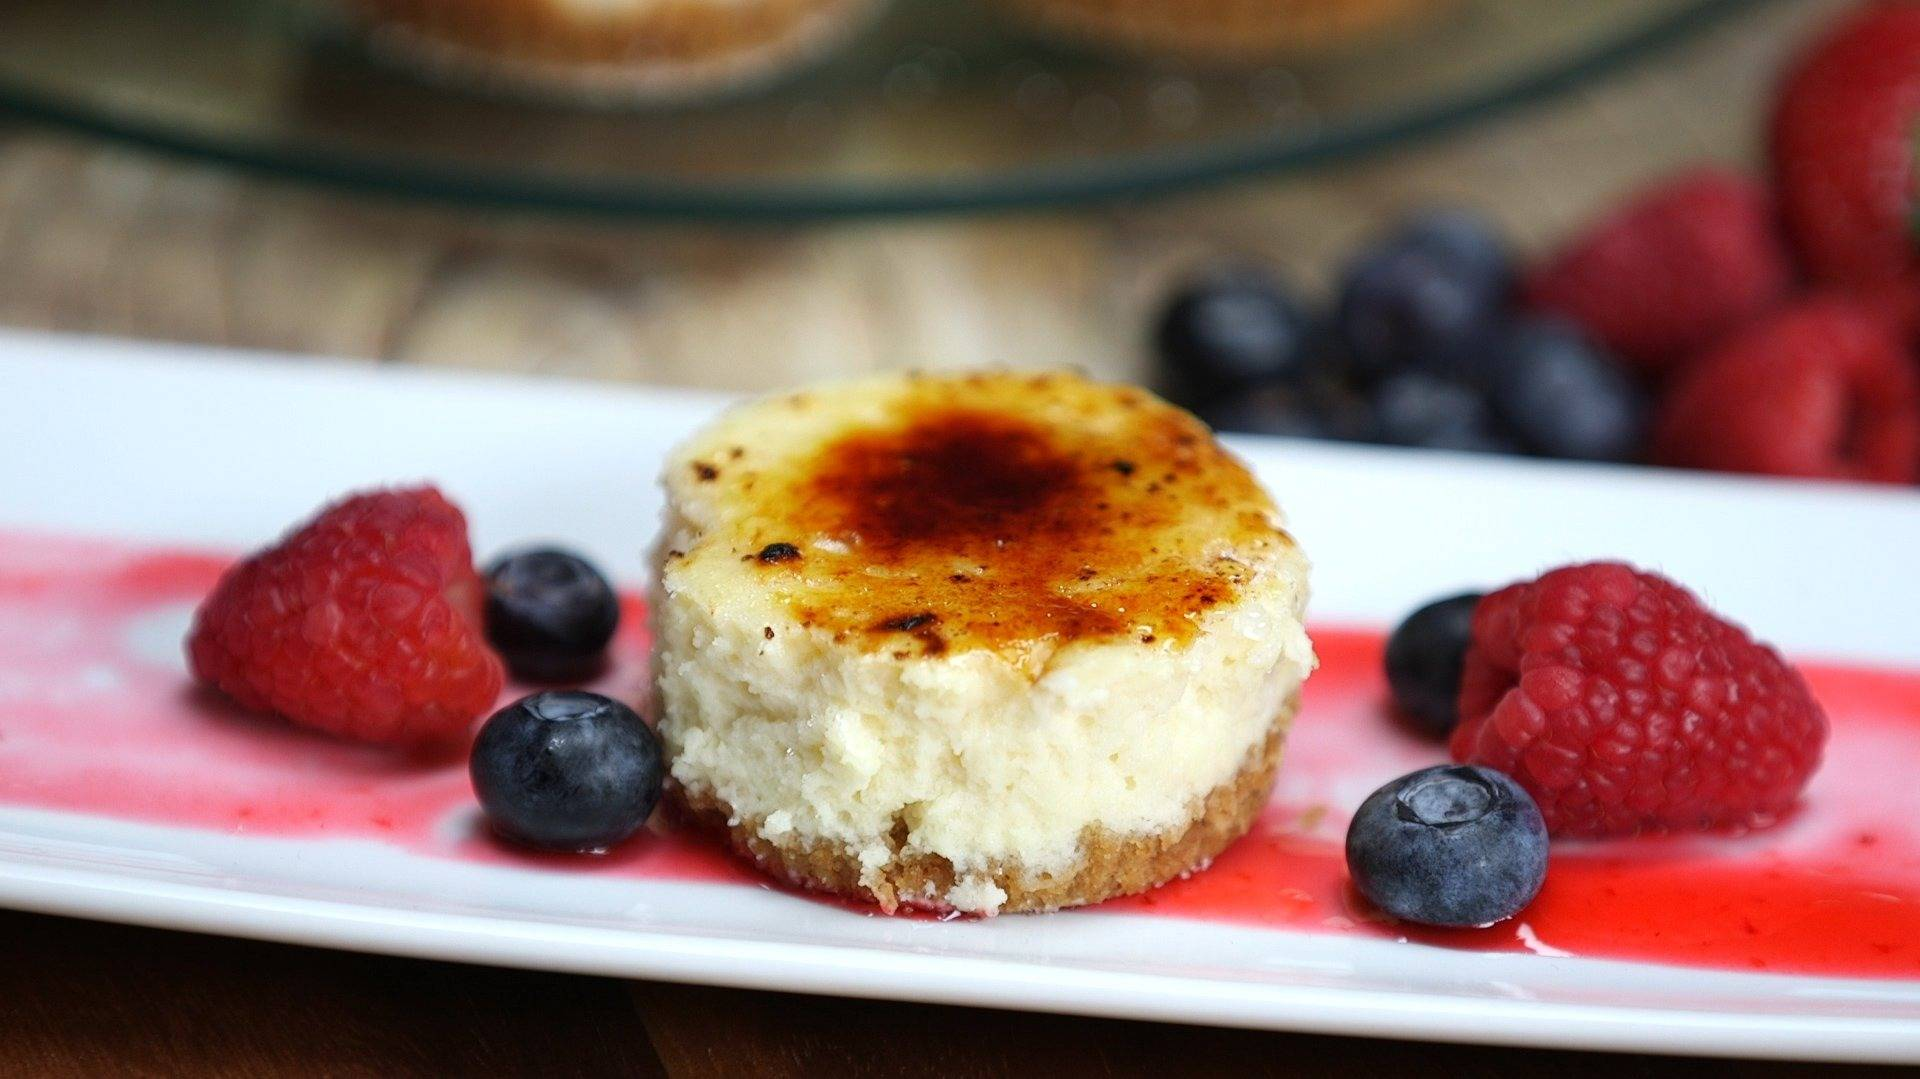 Mini cheesecake with berries 4460x4460